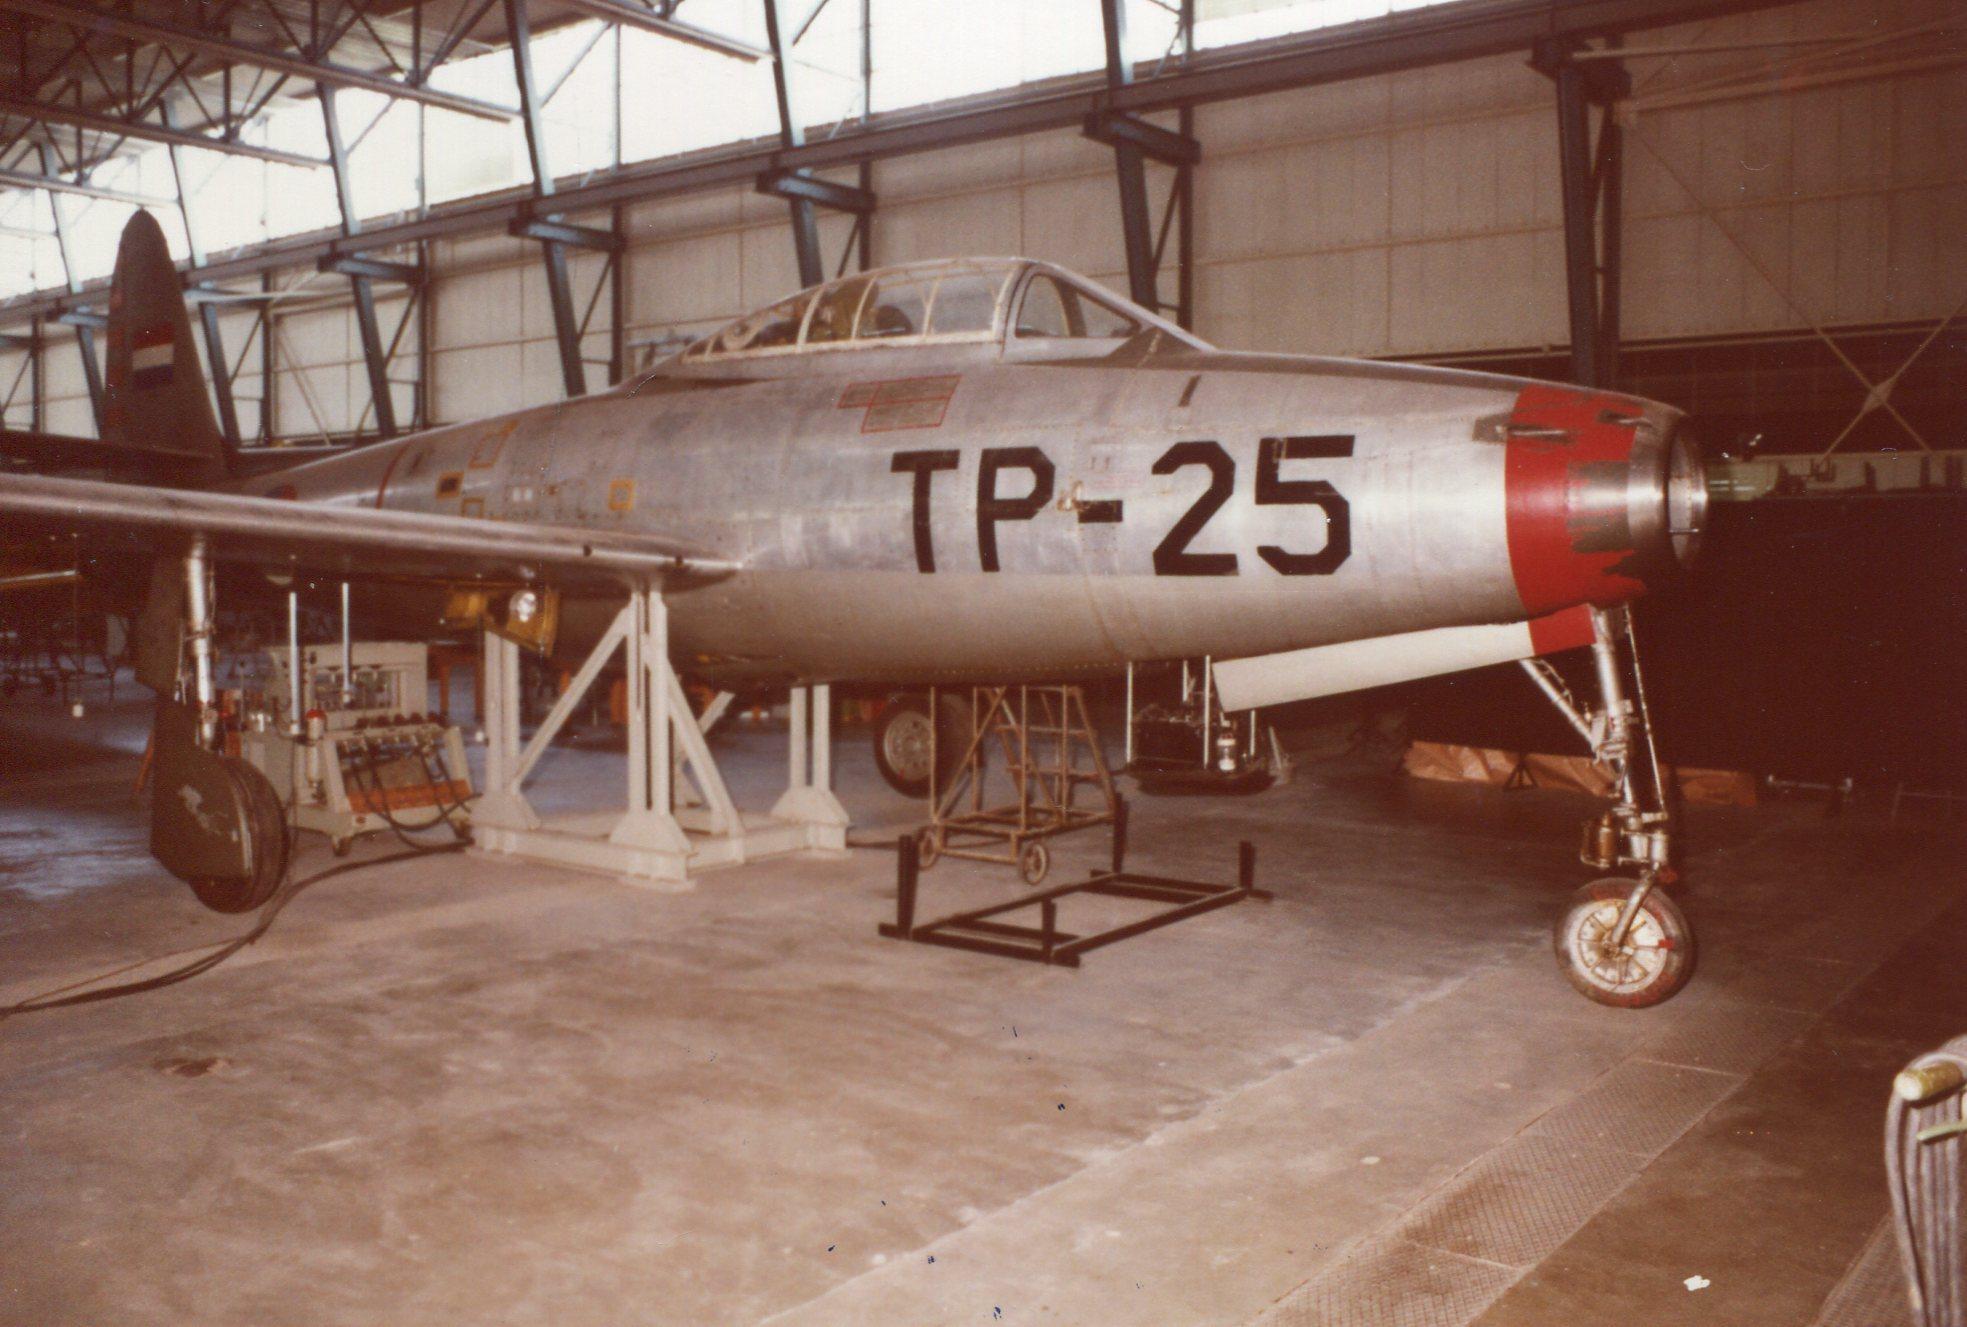 Naam: TH Delft Sept. 1974.jpg Bekeken: 1586 Grootte: 320,9 KB